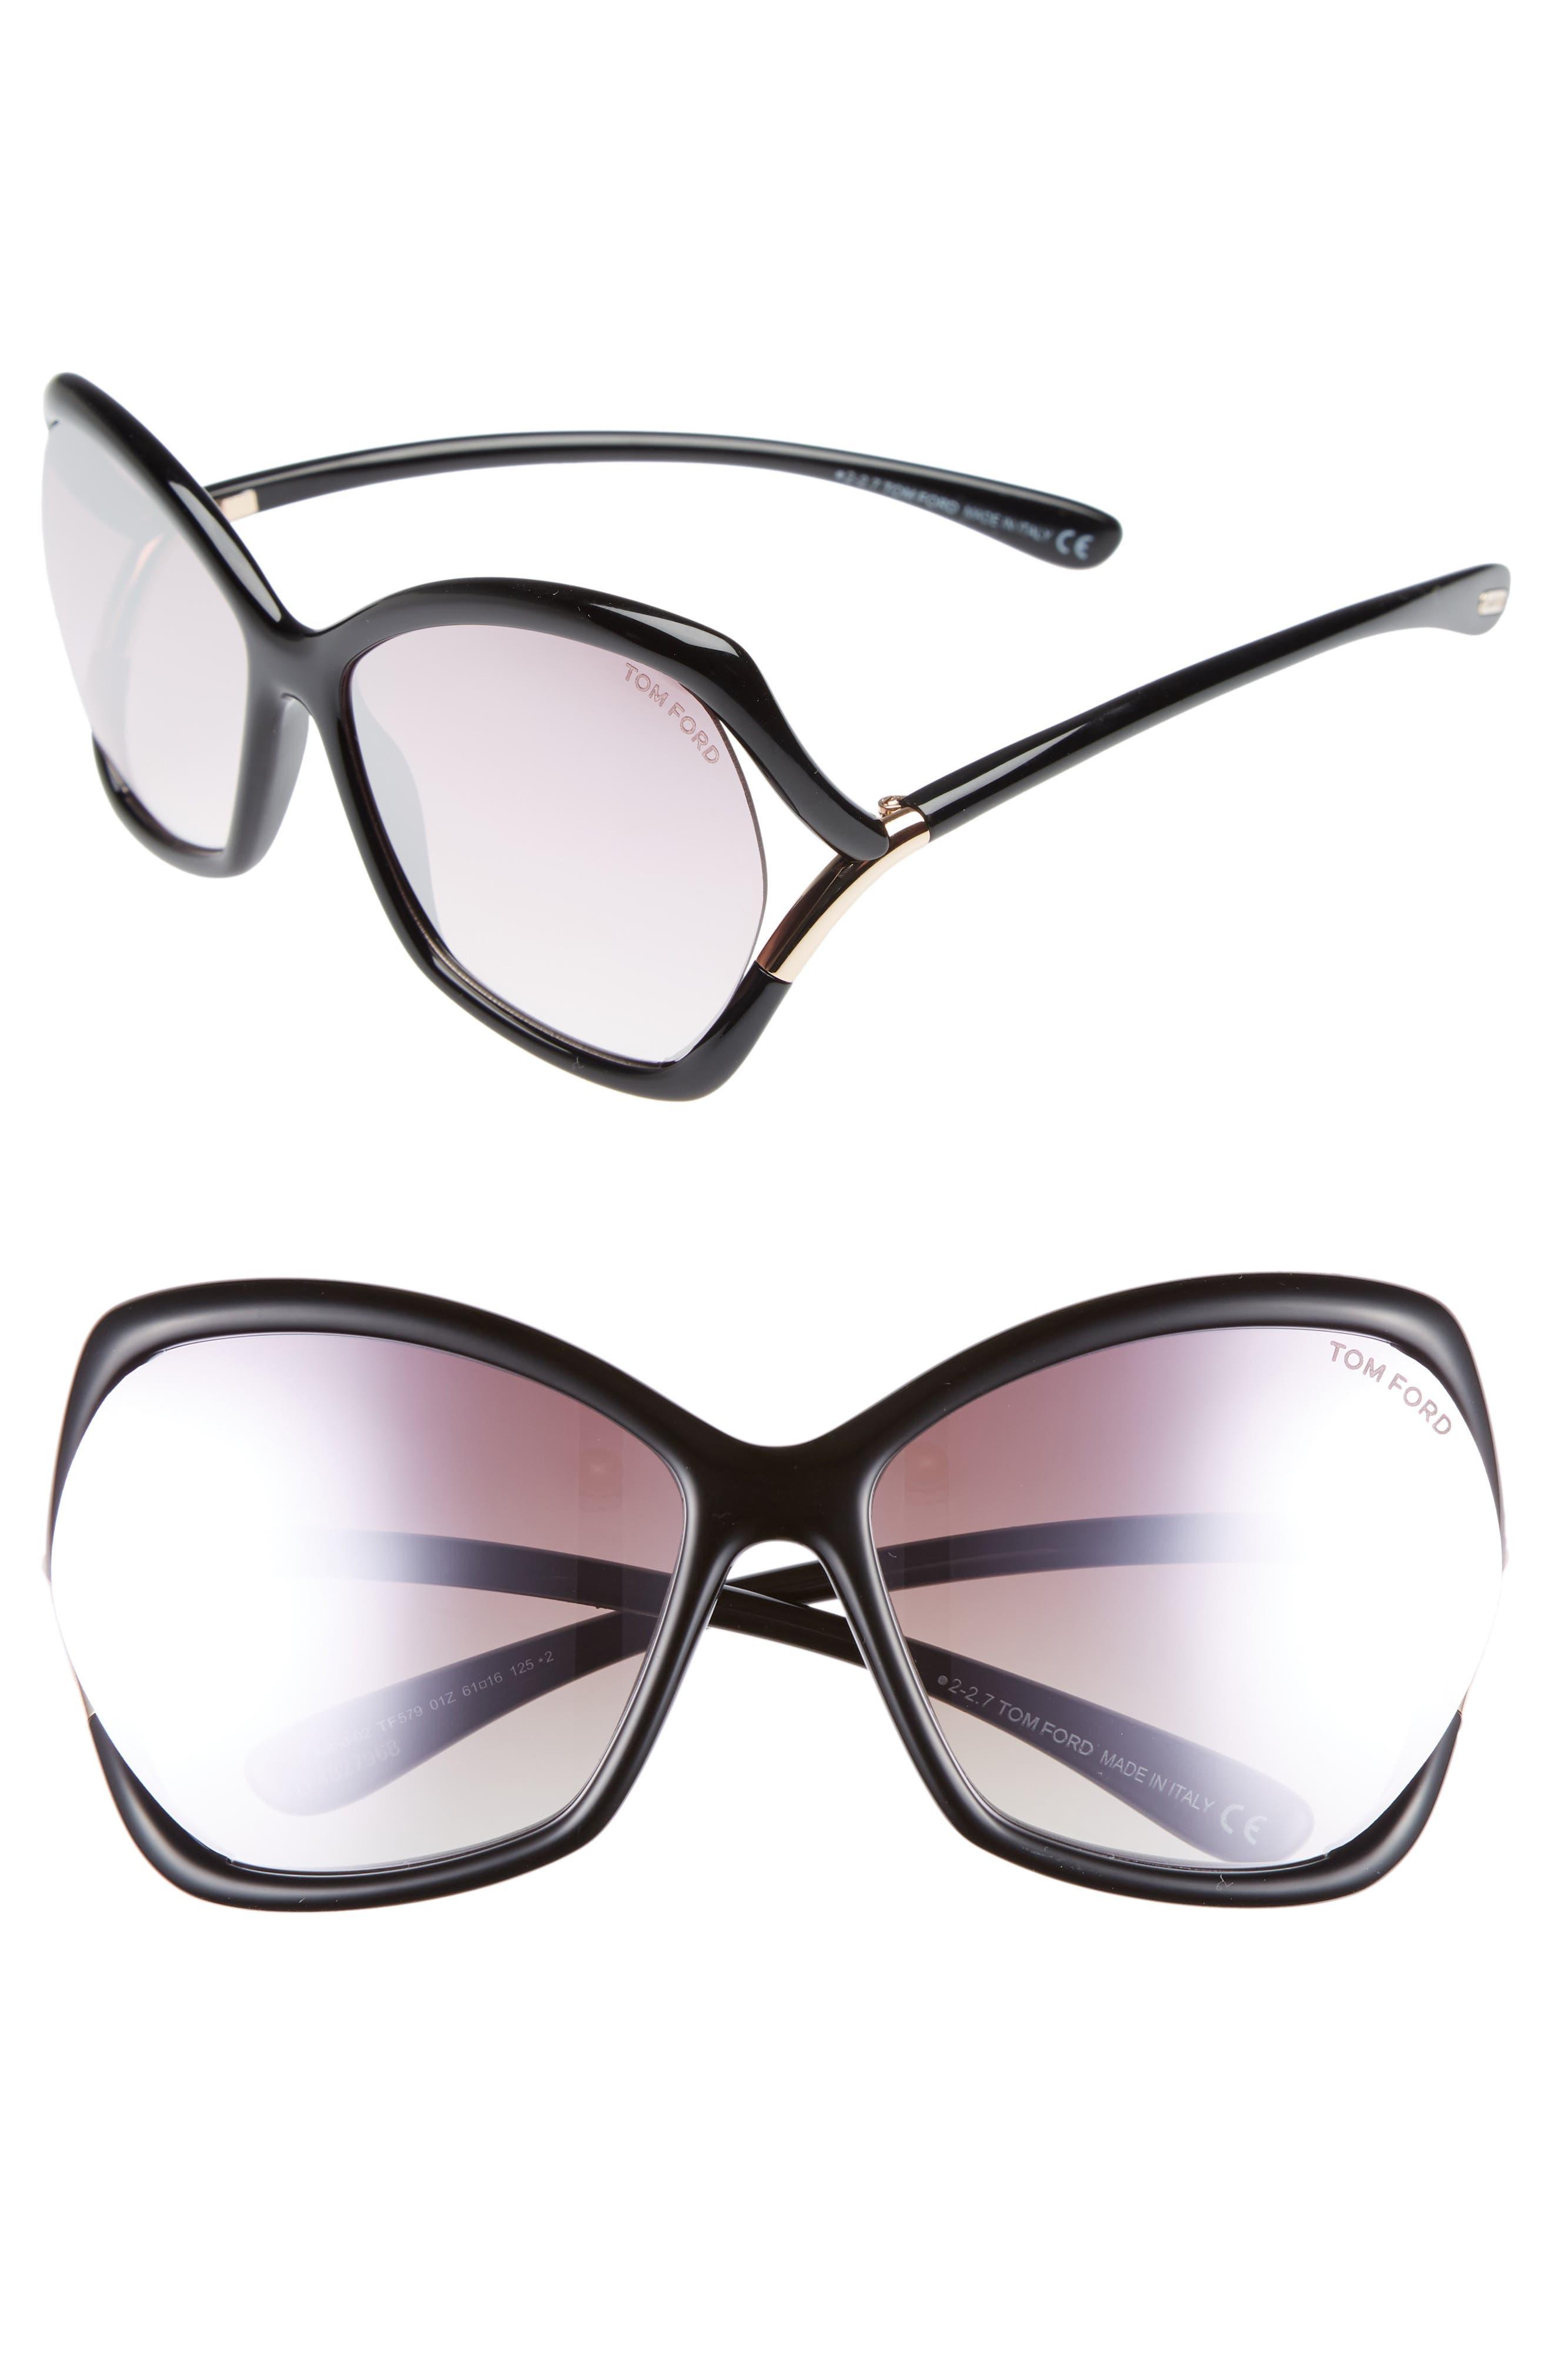 Astrid 61mm Geometric Sunglasses,                         Main,                         color, Black/ Rose Gold/ Pink/ Silver